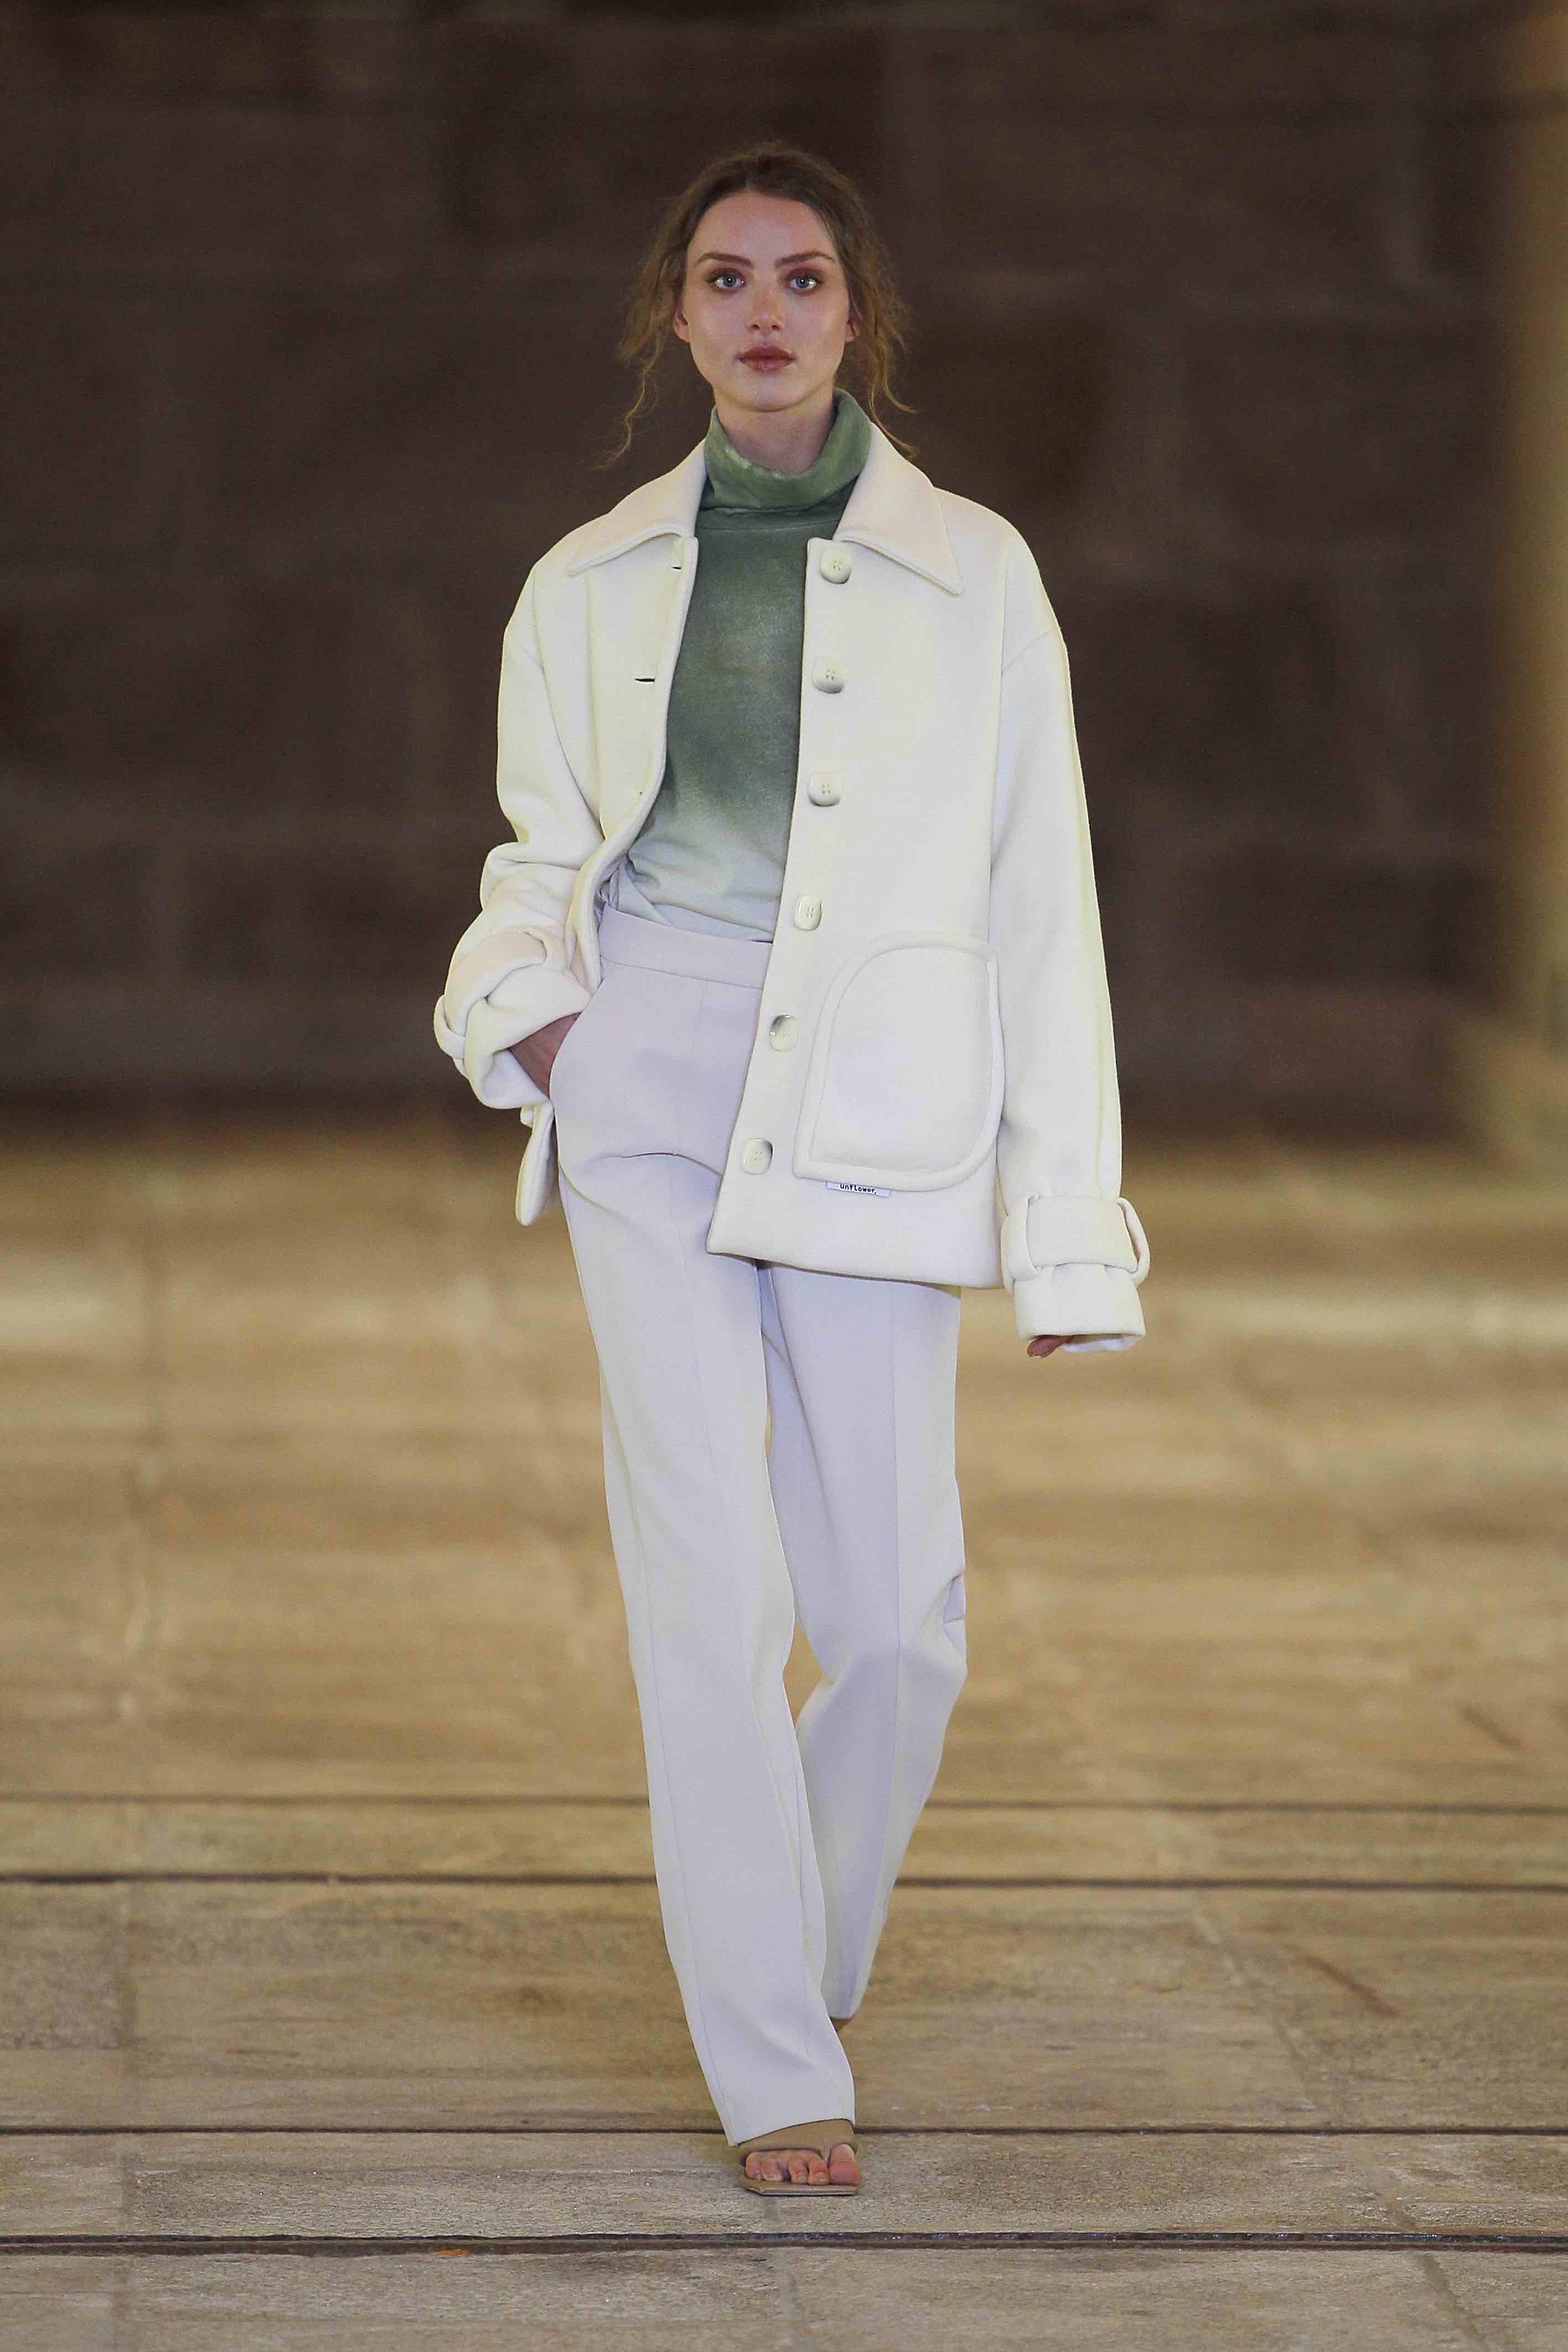 Portugal Fashion #SofaEdition 0